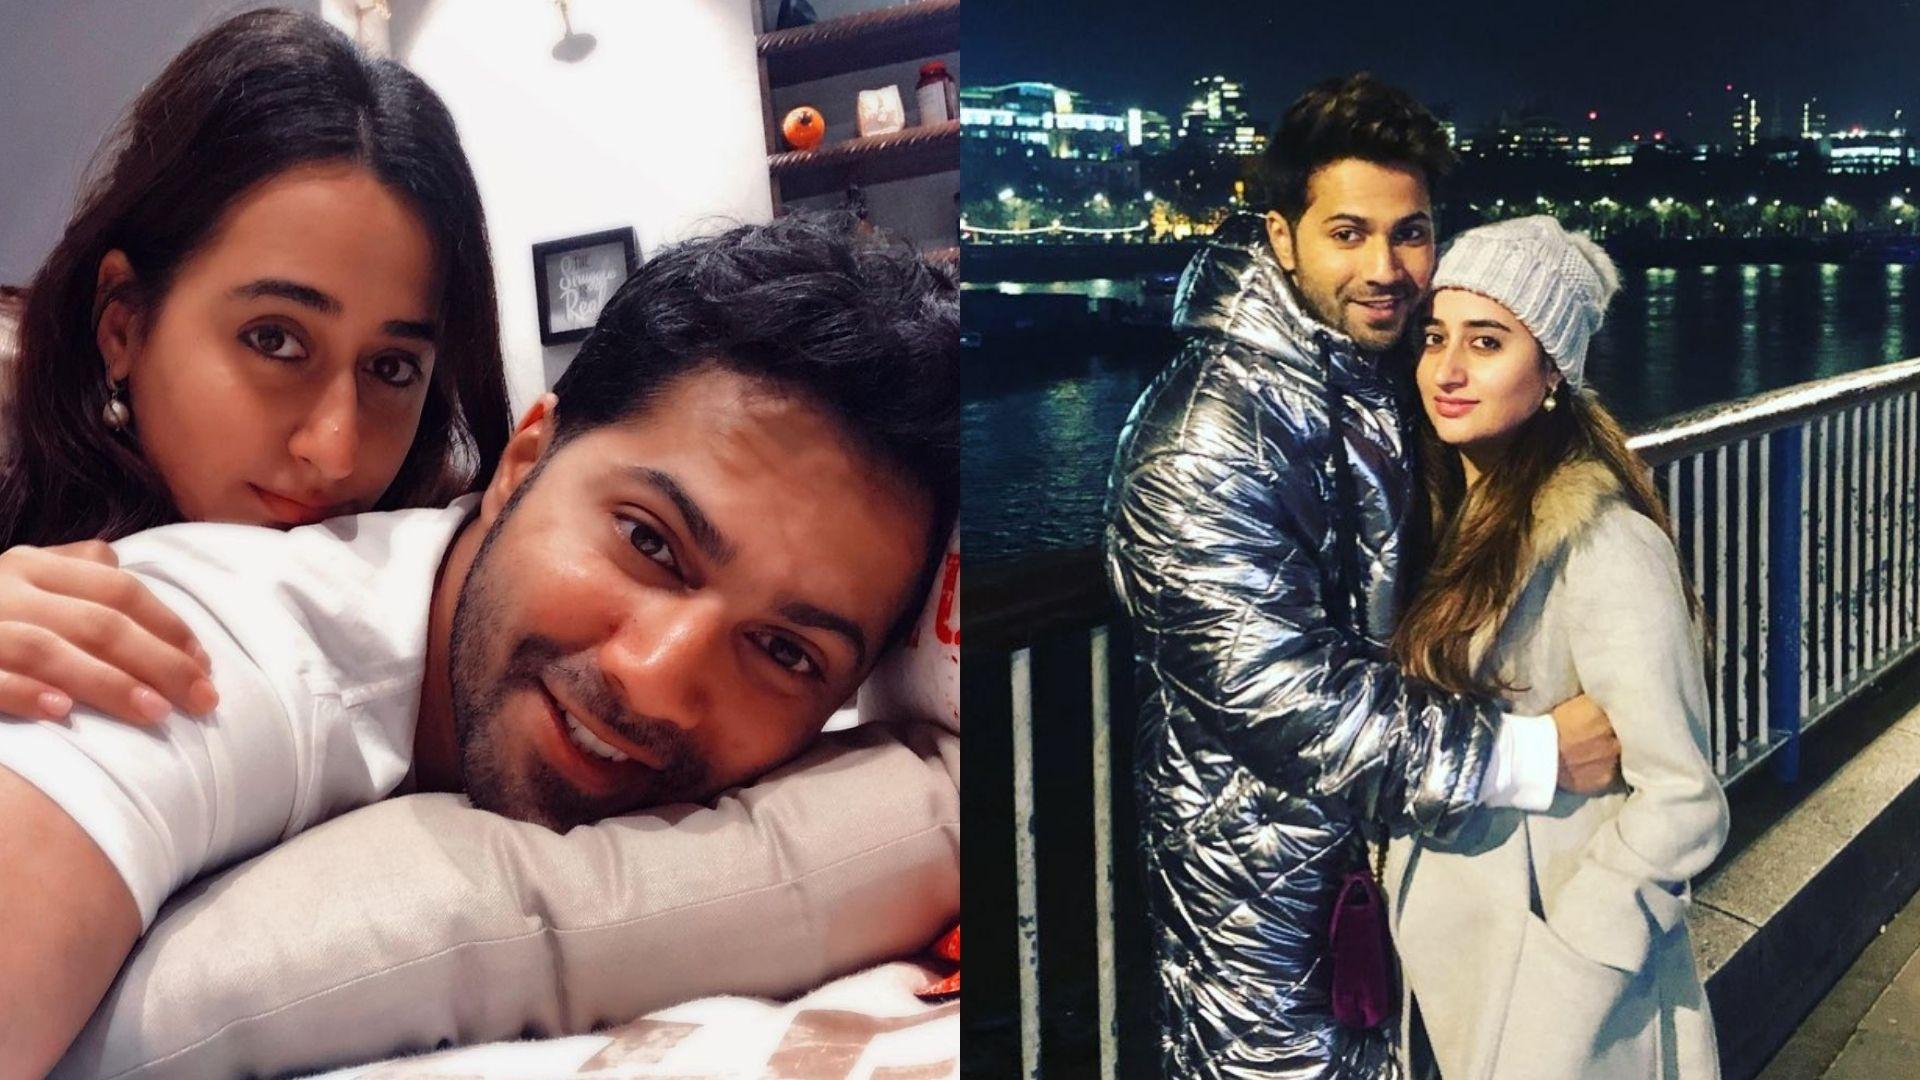 PICS INSIDE: Varun Dhawan And Natasha Dalal Dash Off For An Exotic Vacation; Couple Keeps It Cool At Candid At The Airport